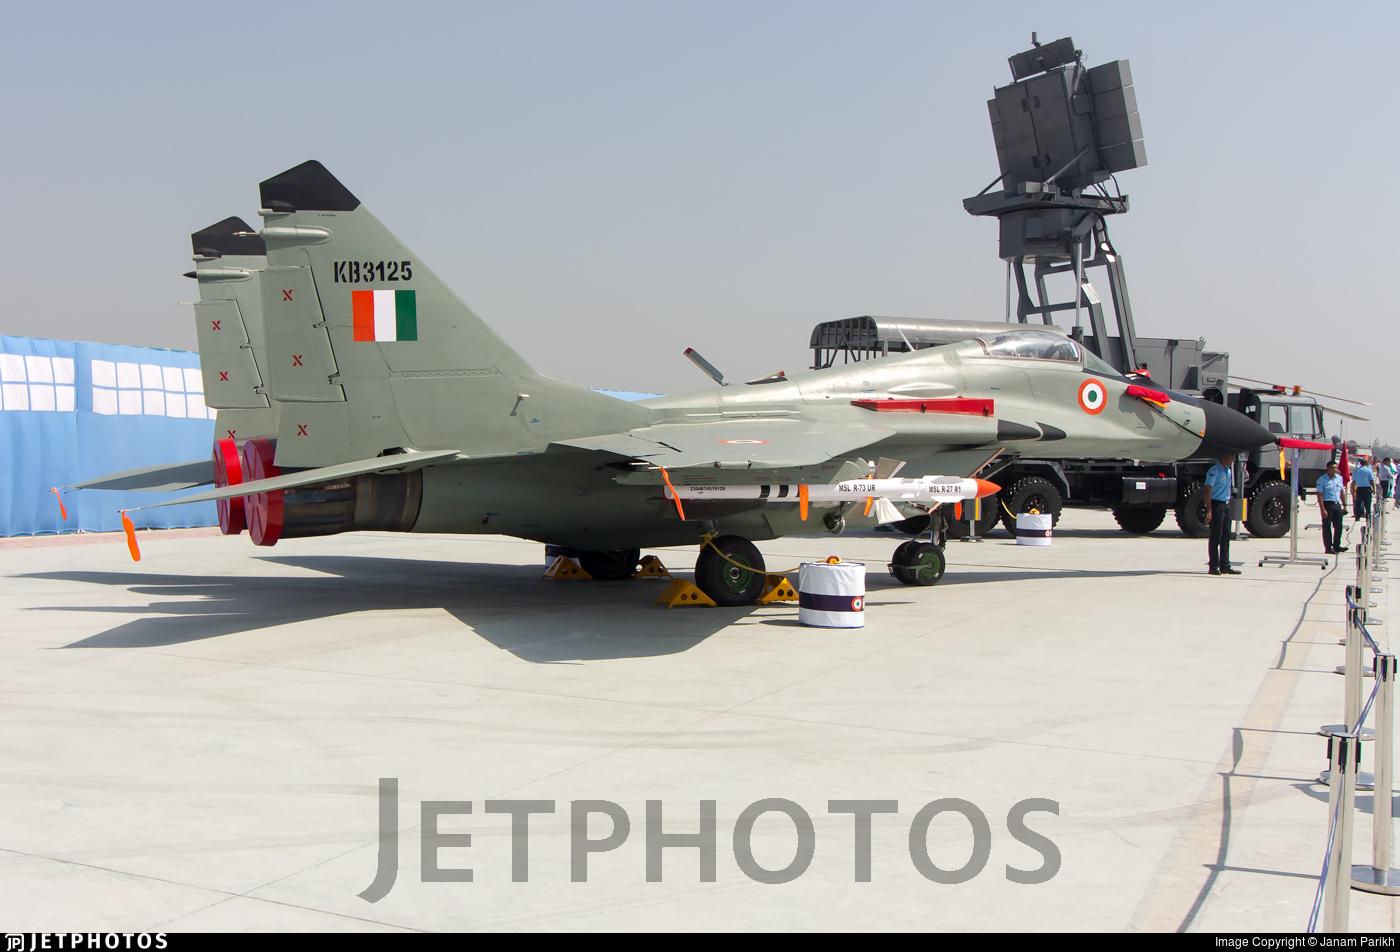 KB3125 - Mikoyan-Gurevich MiG-29B Fulcrum - India - Air Force